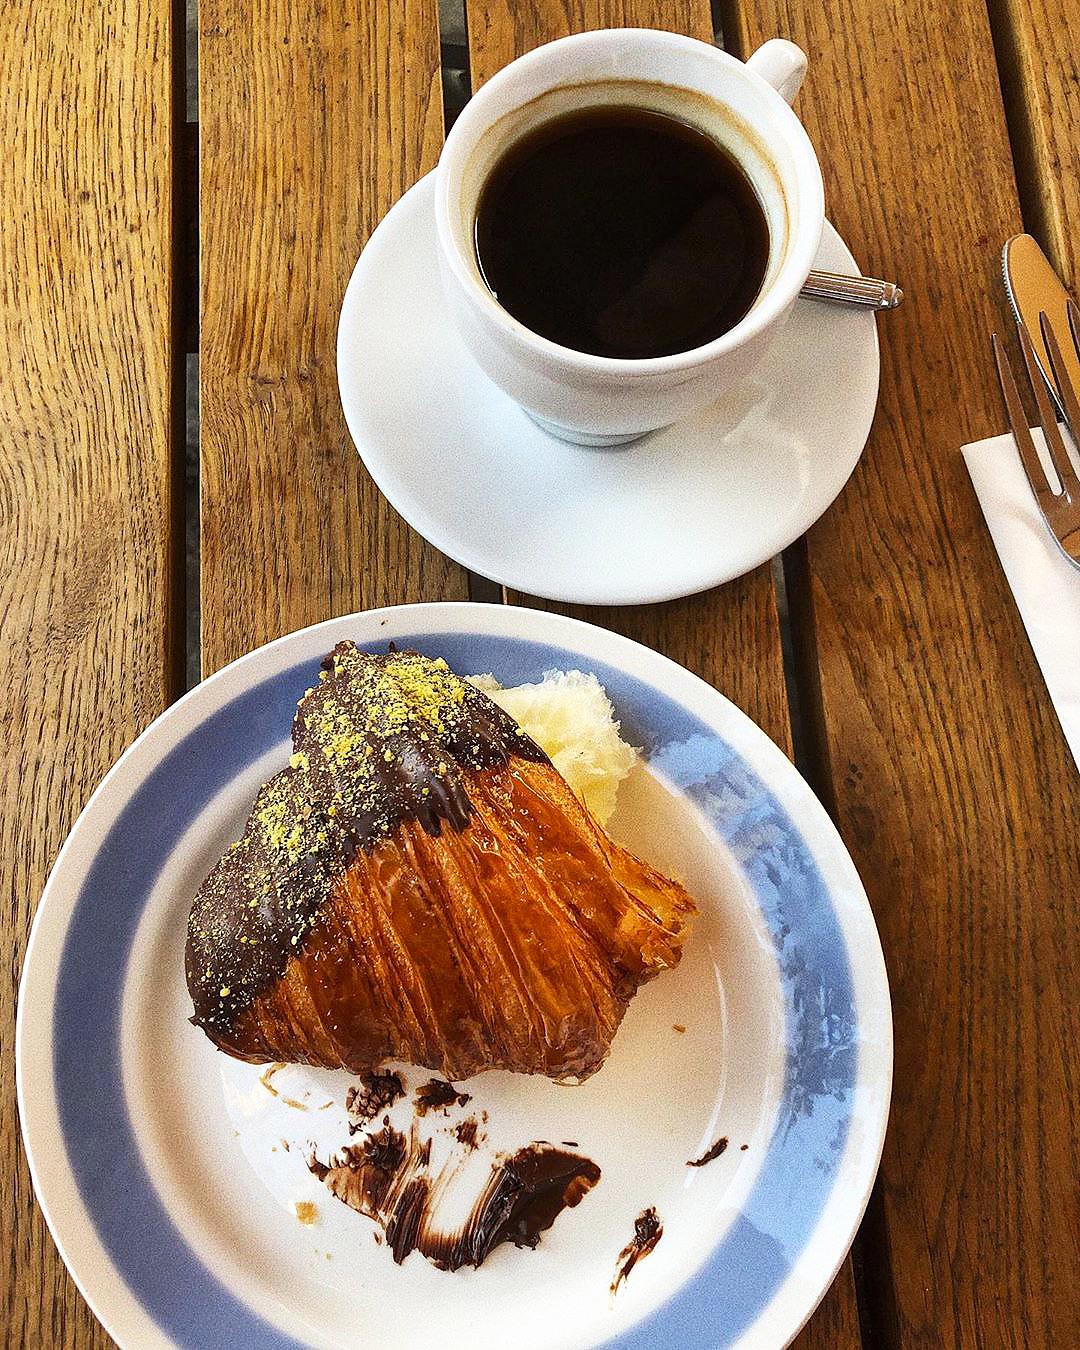 Круассан и кофе в ресторане Remy Kitchen Bakery